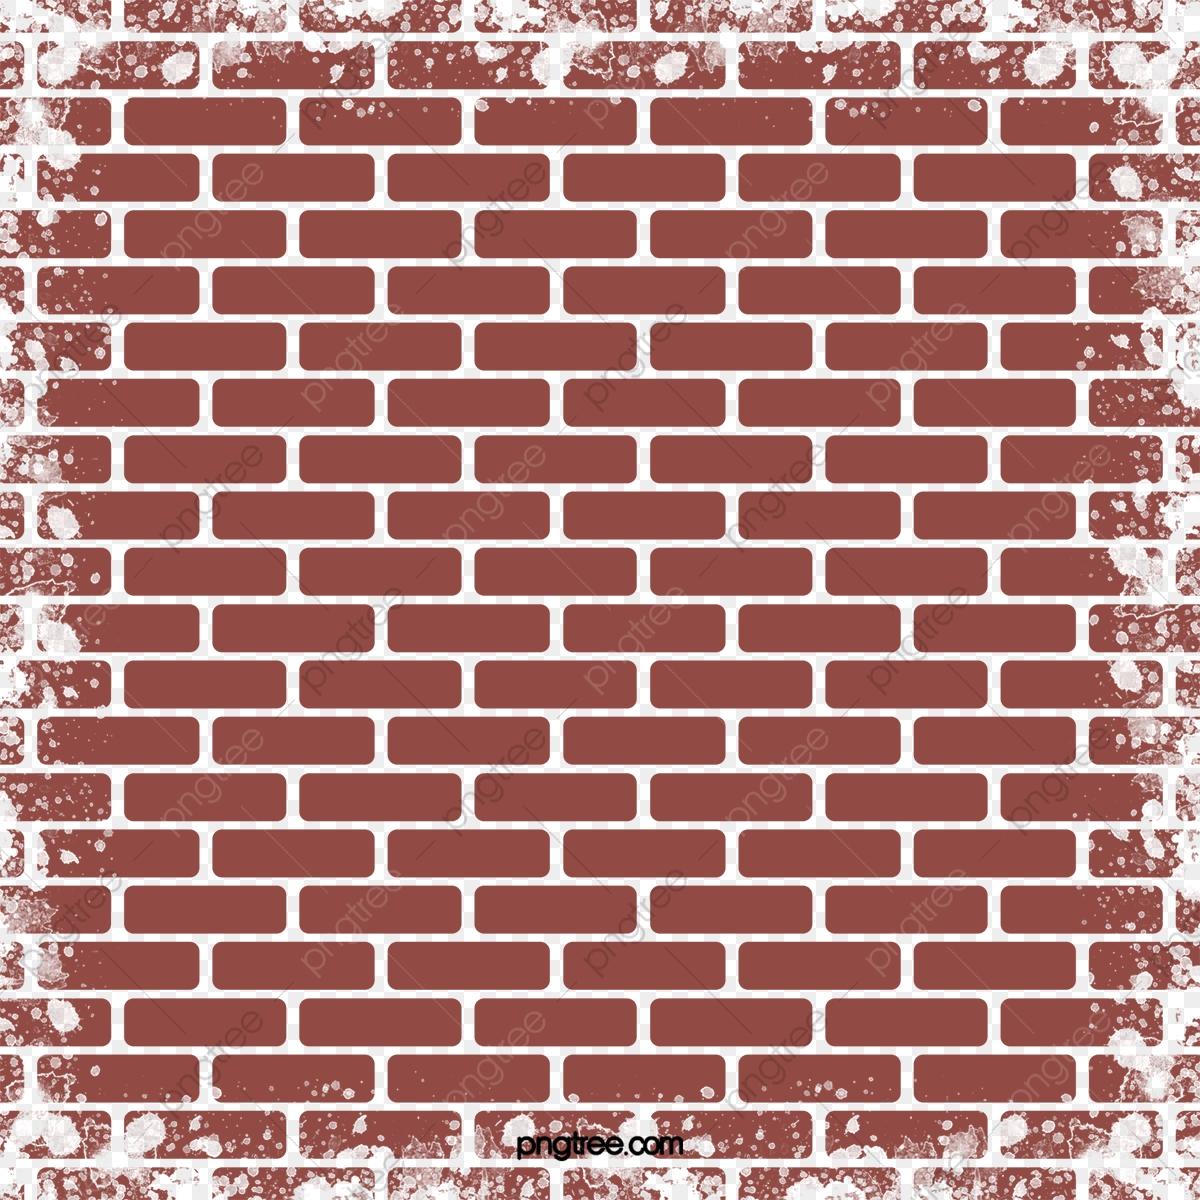 Red wall png transparent. Brick clipart plain